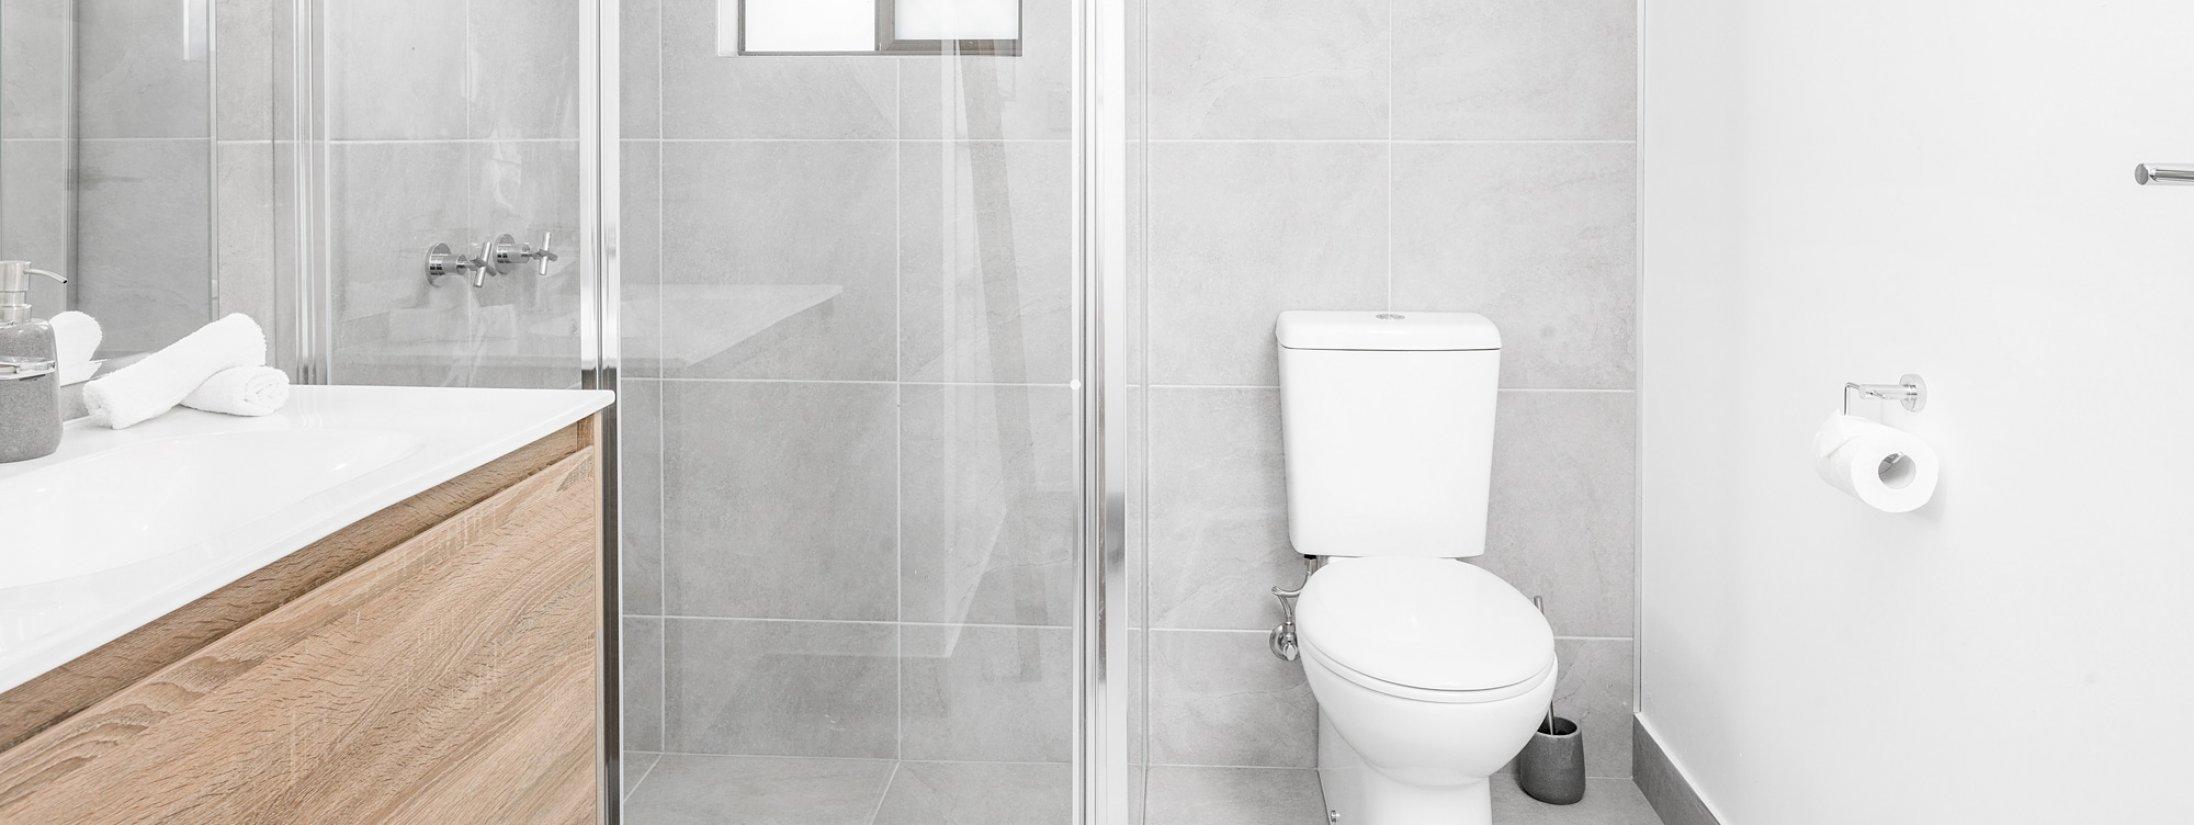 Sea Salt - Byron Bay - Shared Bathroom a